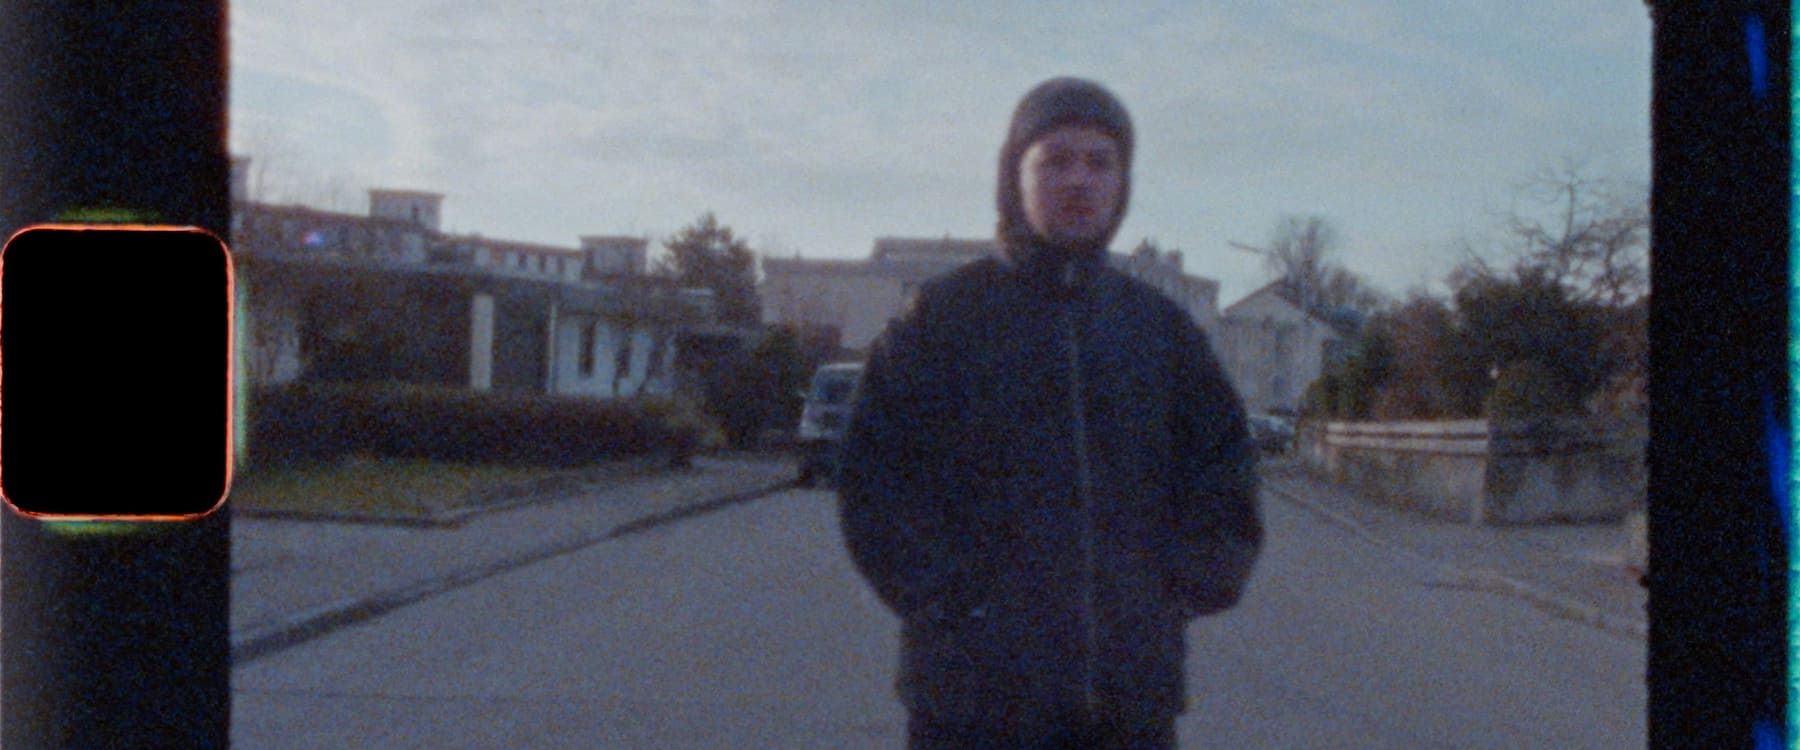 Super 8 Kamera Aufnahme Musikvideo